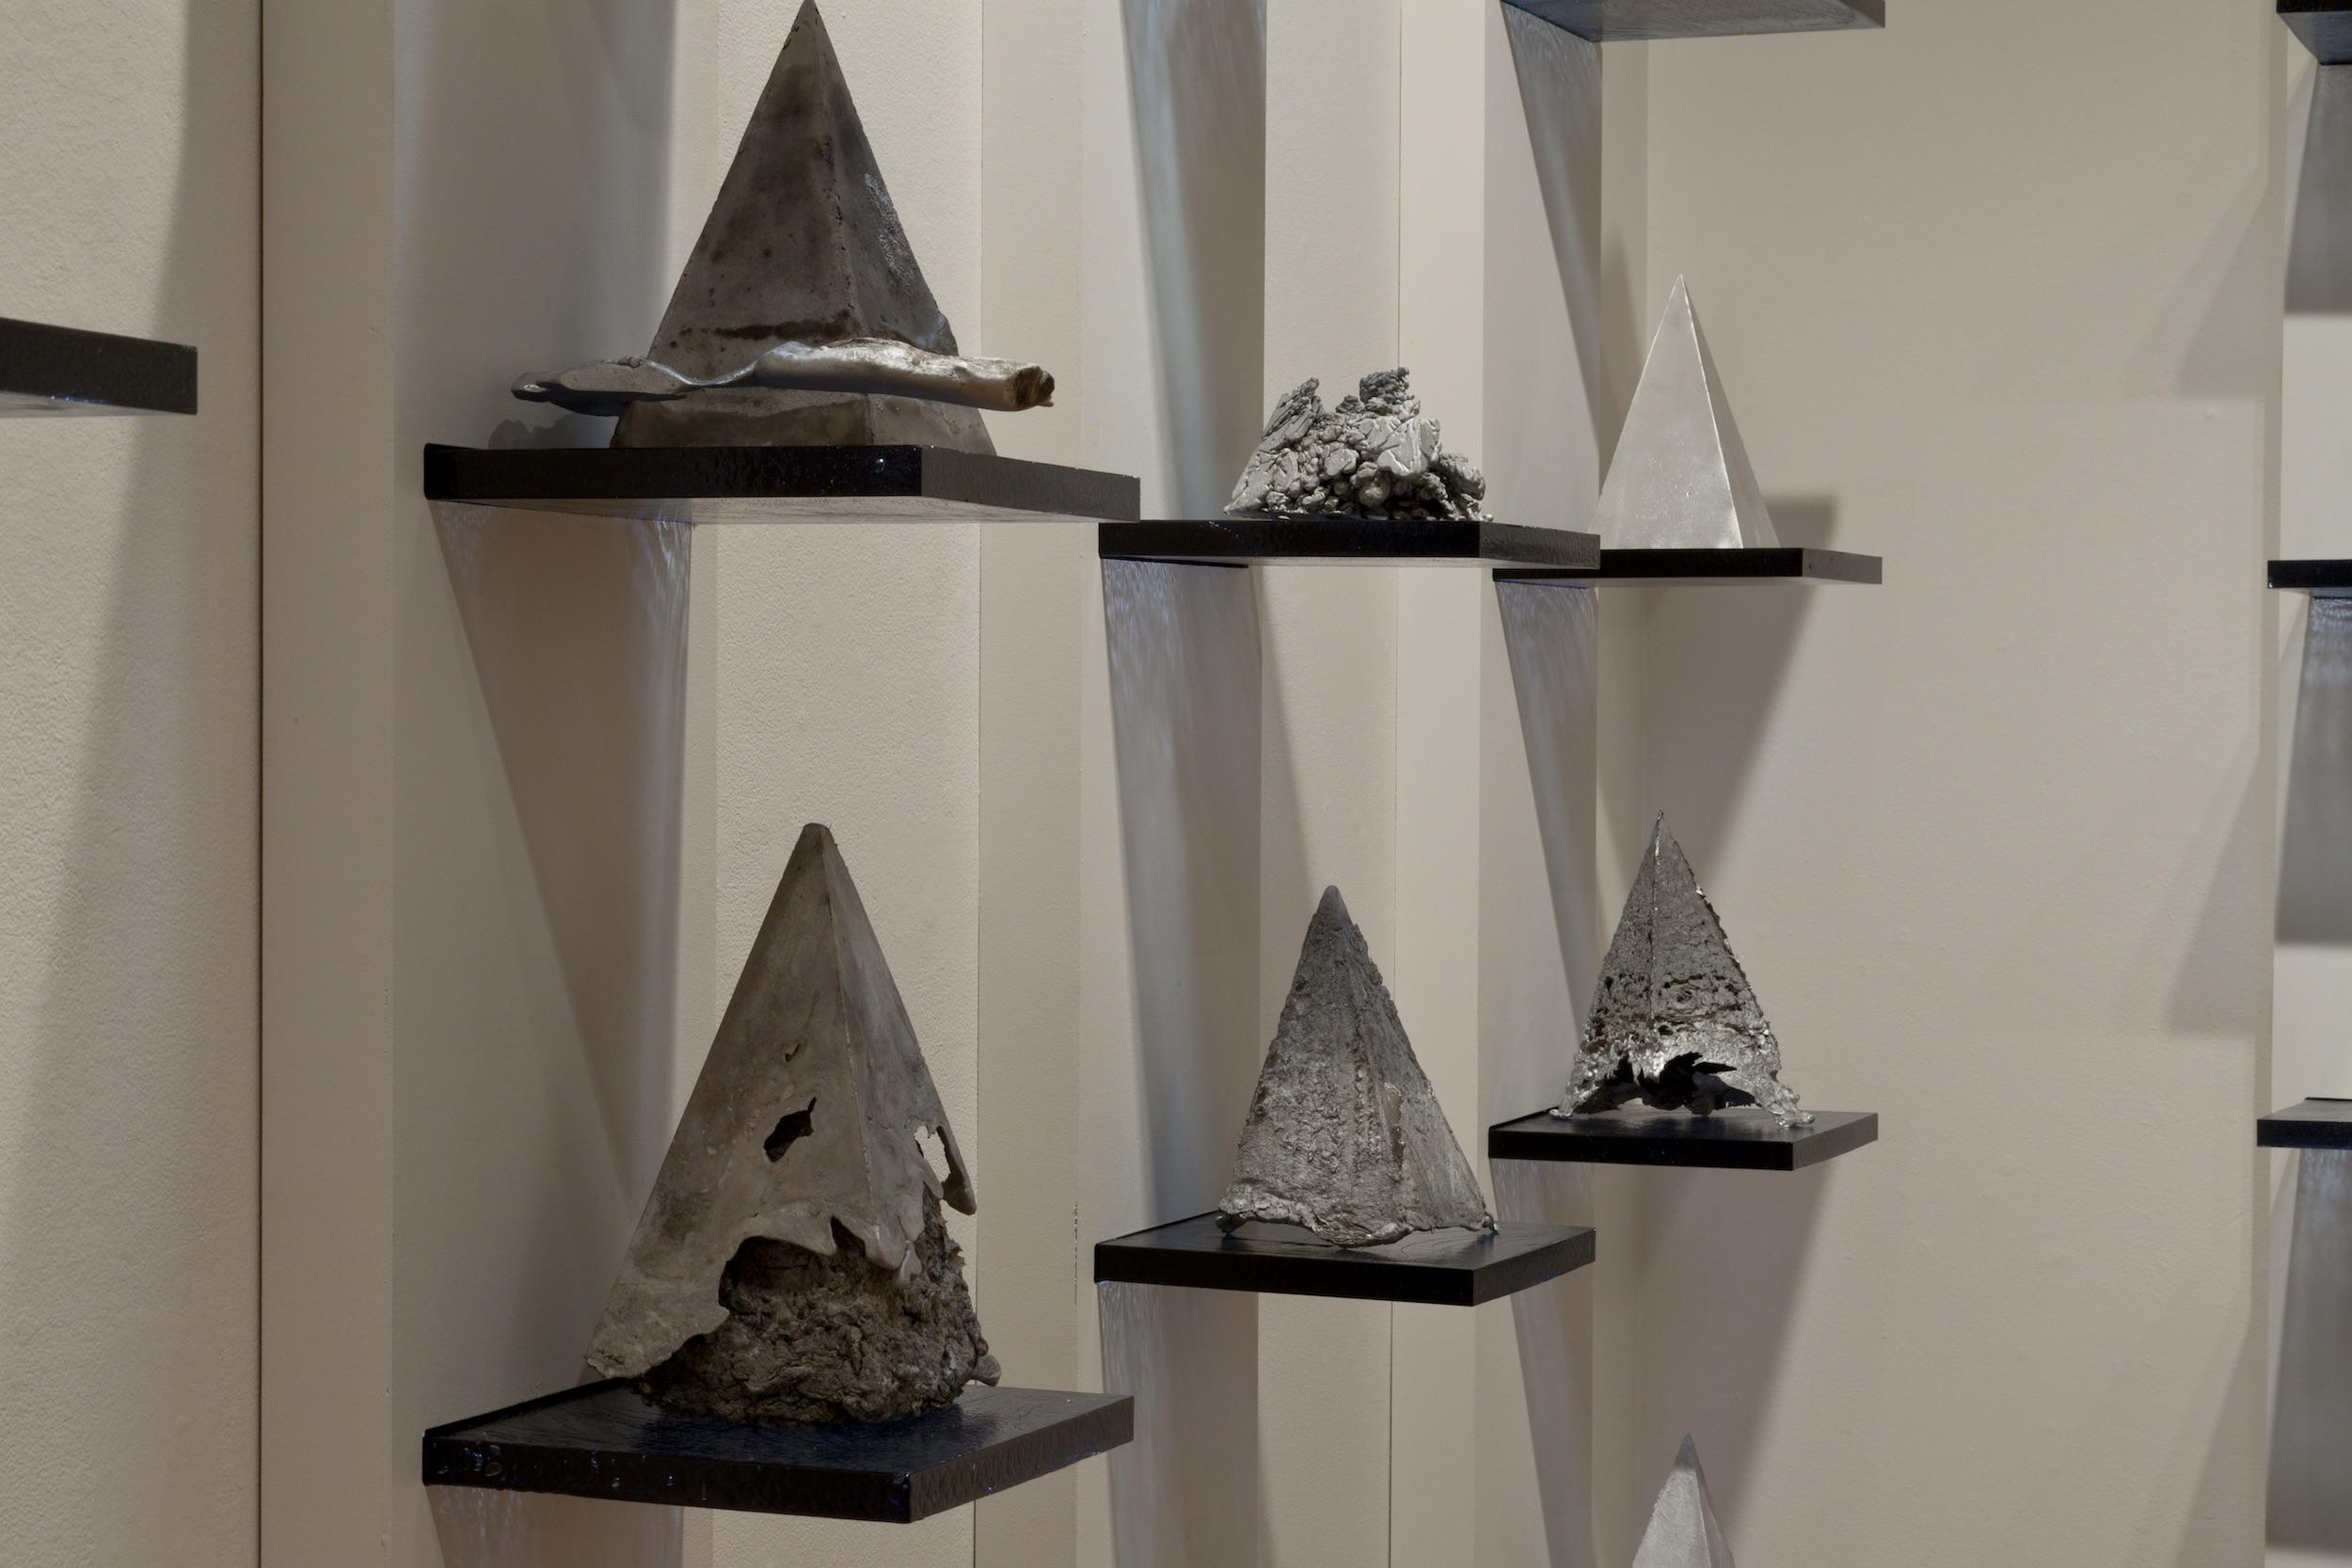 Pyramids detail